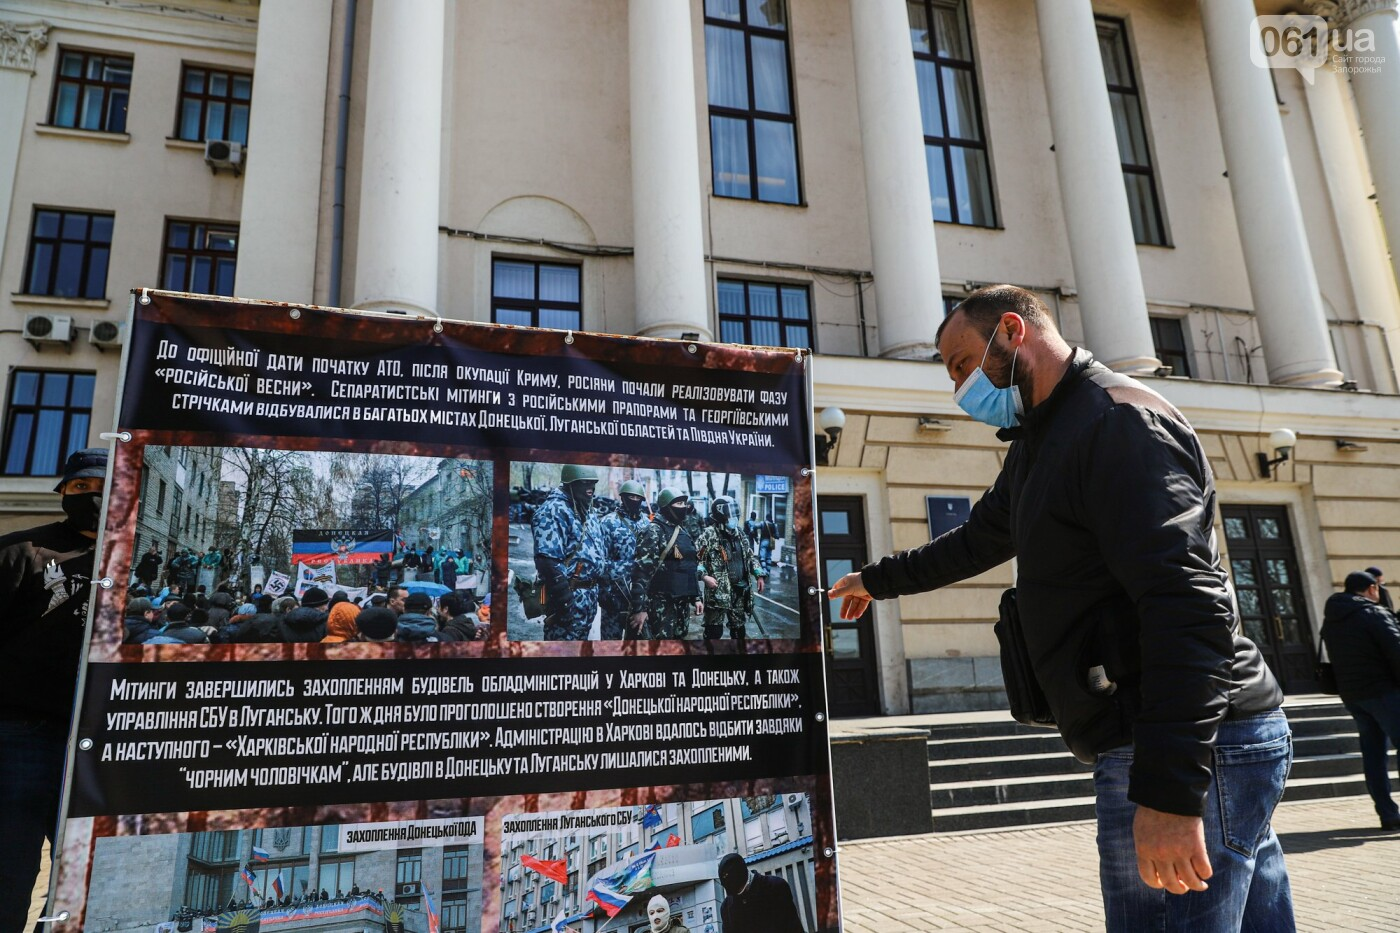 В Запорожье возле мэрии установили стенды с портретами Медведчука и Шария, - ФОТО, фото-2